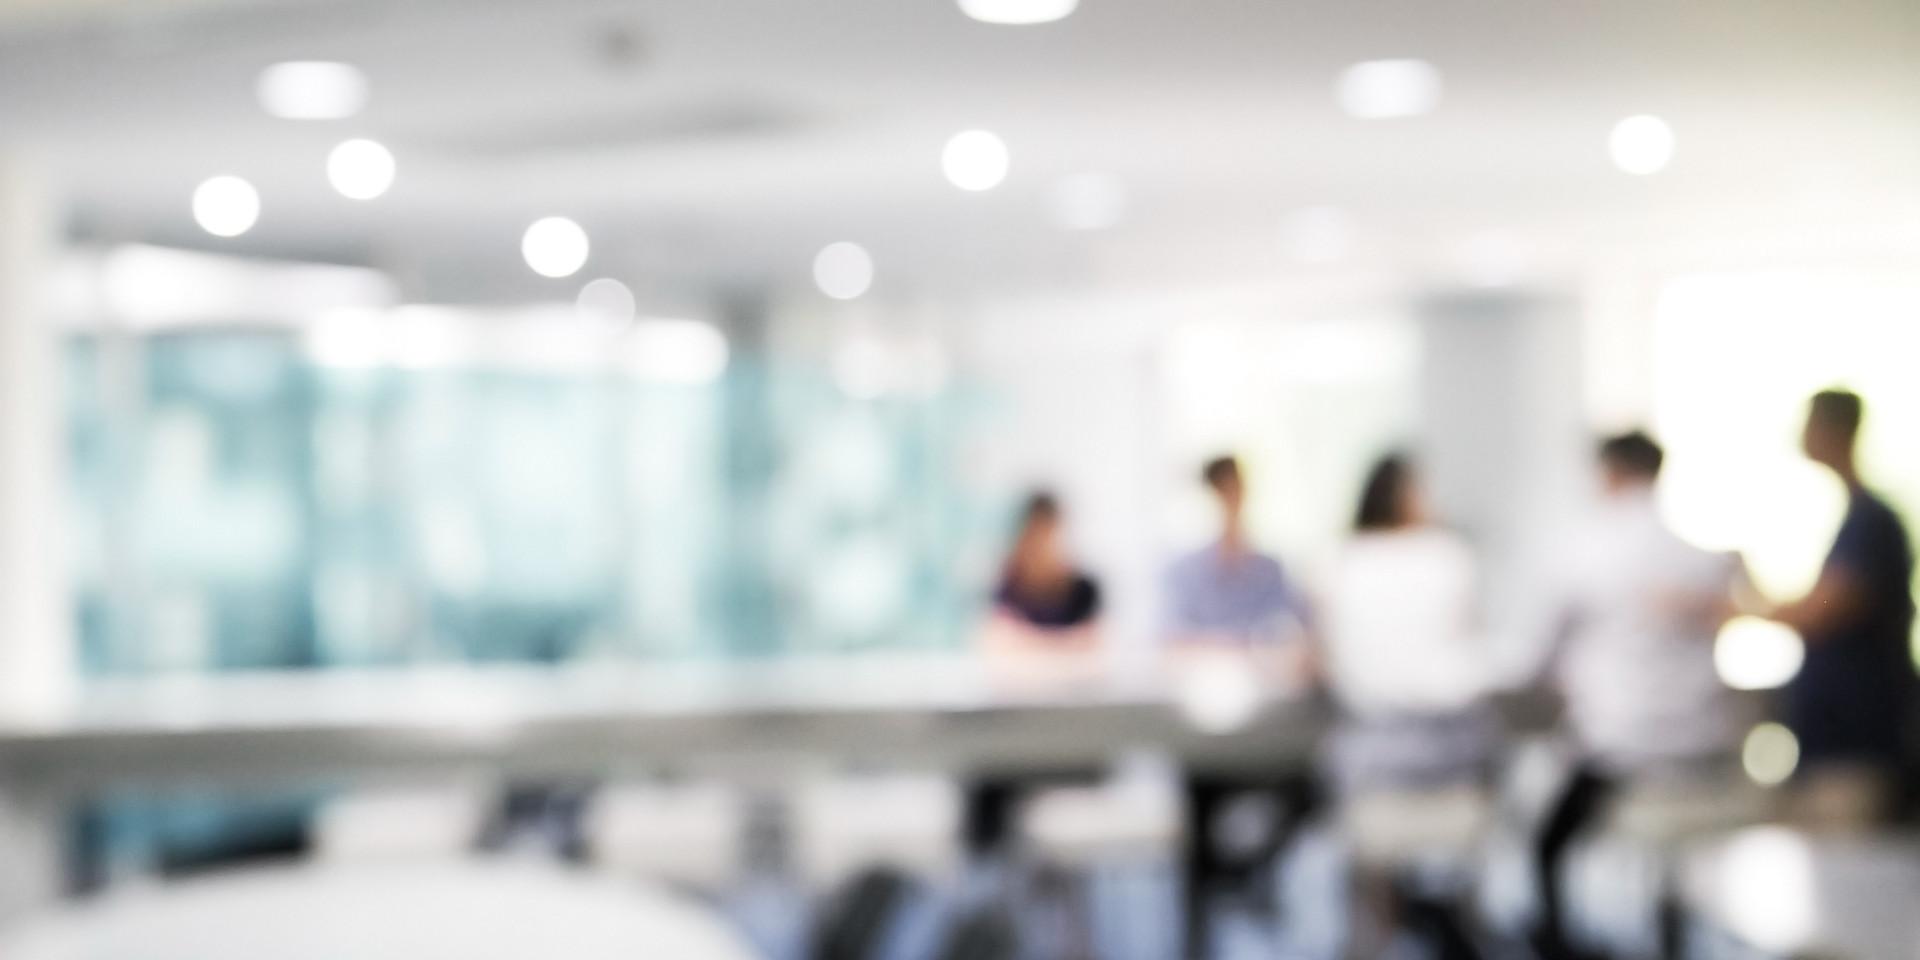 Blurred image of people meeting.